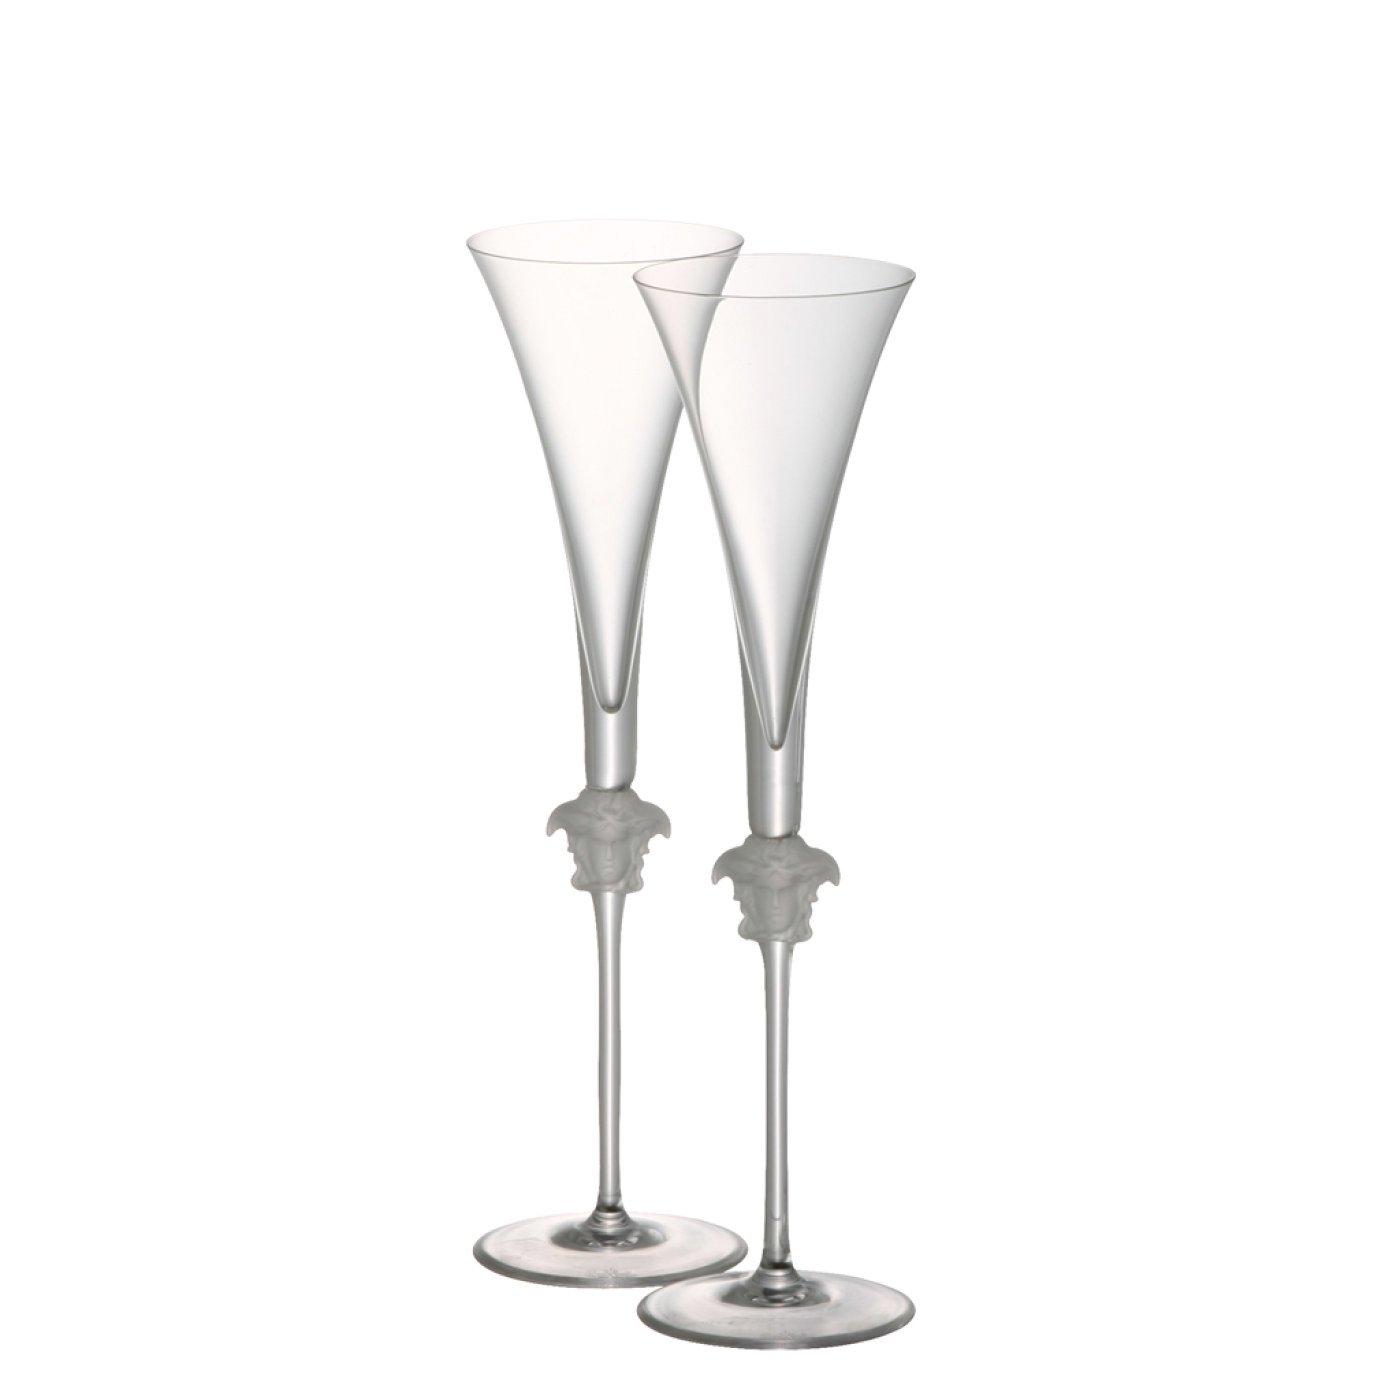 Rosenthal meets Versace Champagne Flutes Medusa Lumiere – Elegant Crystal Stemware Designed by Gianni Versace – Set of 2 Glasses